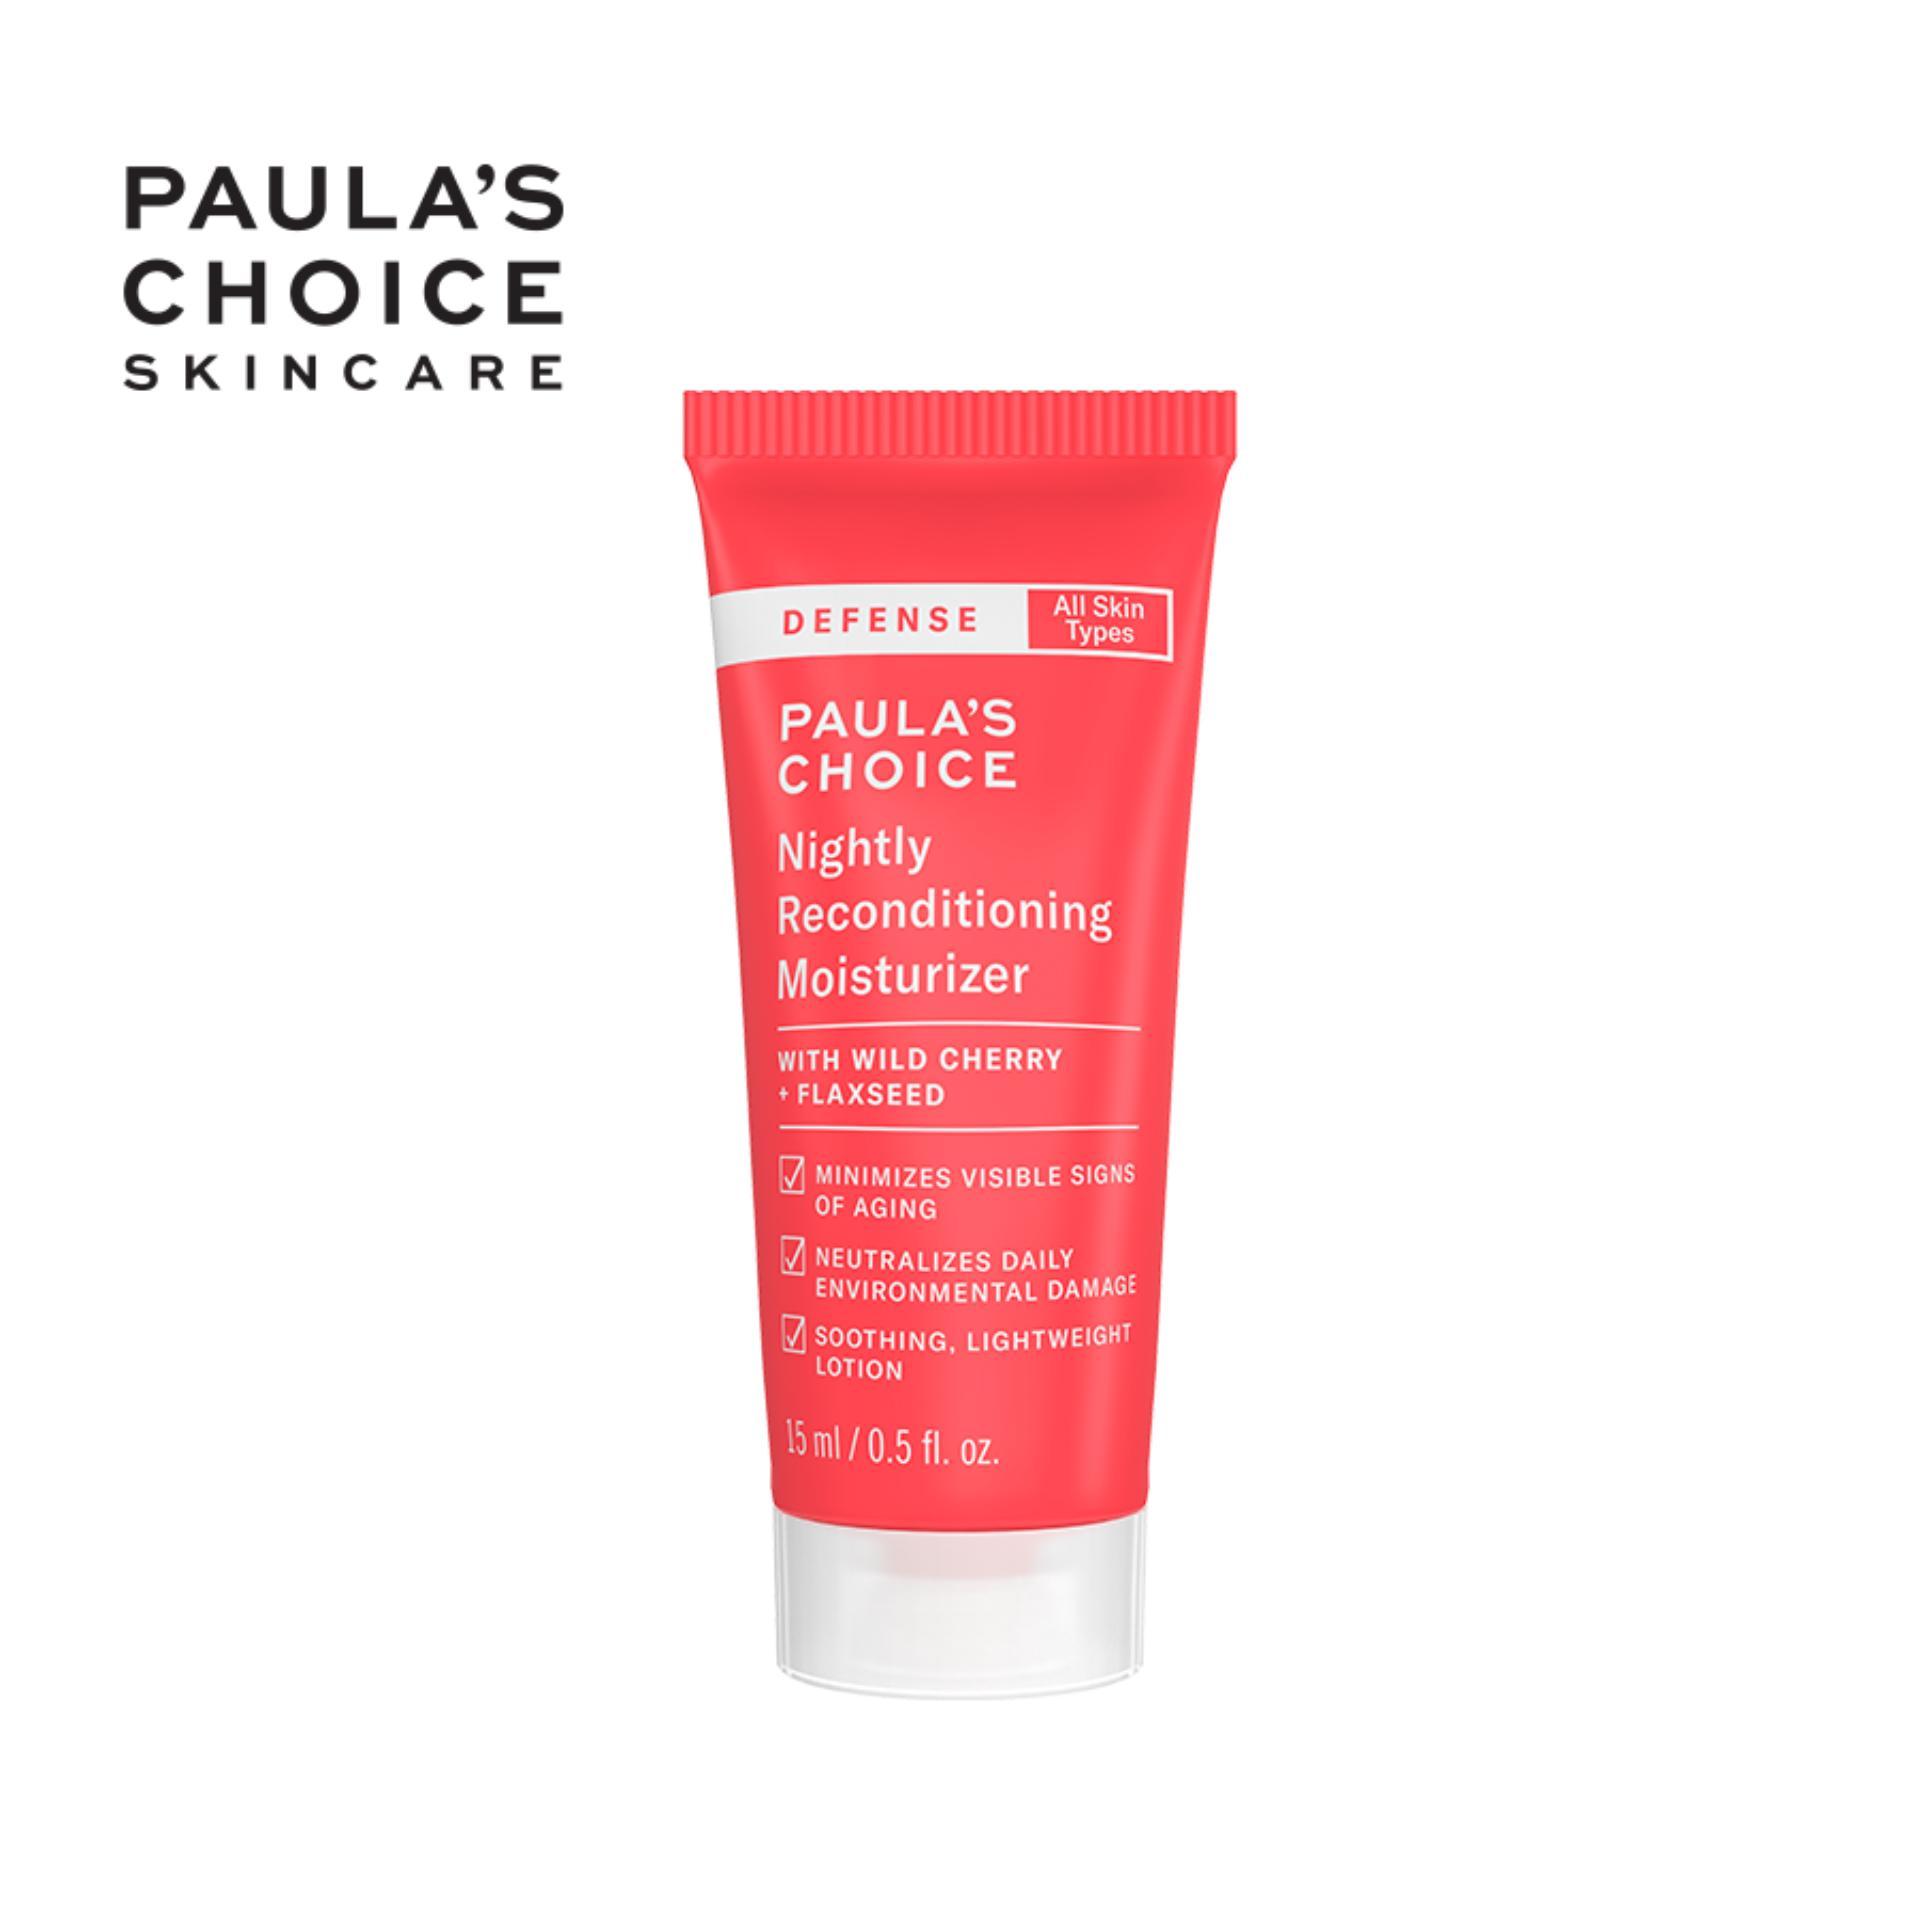 Dưỡng ẩm cho làn da mềm mịn Paula's Choice Defense Nightly Reconditioning Moisturizer 60ml-2220